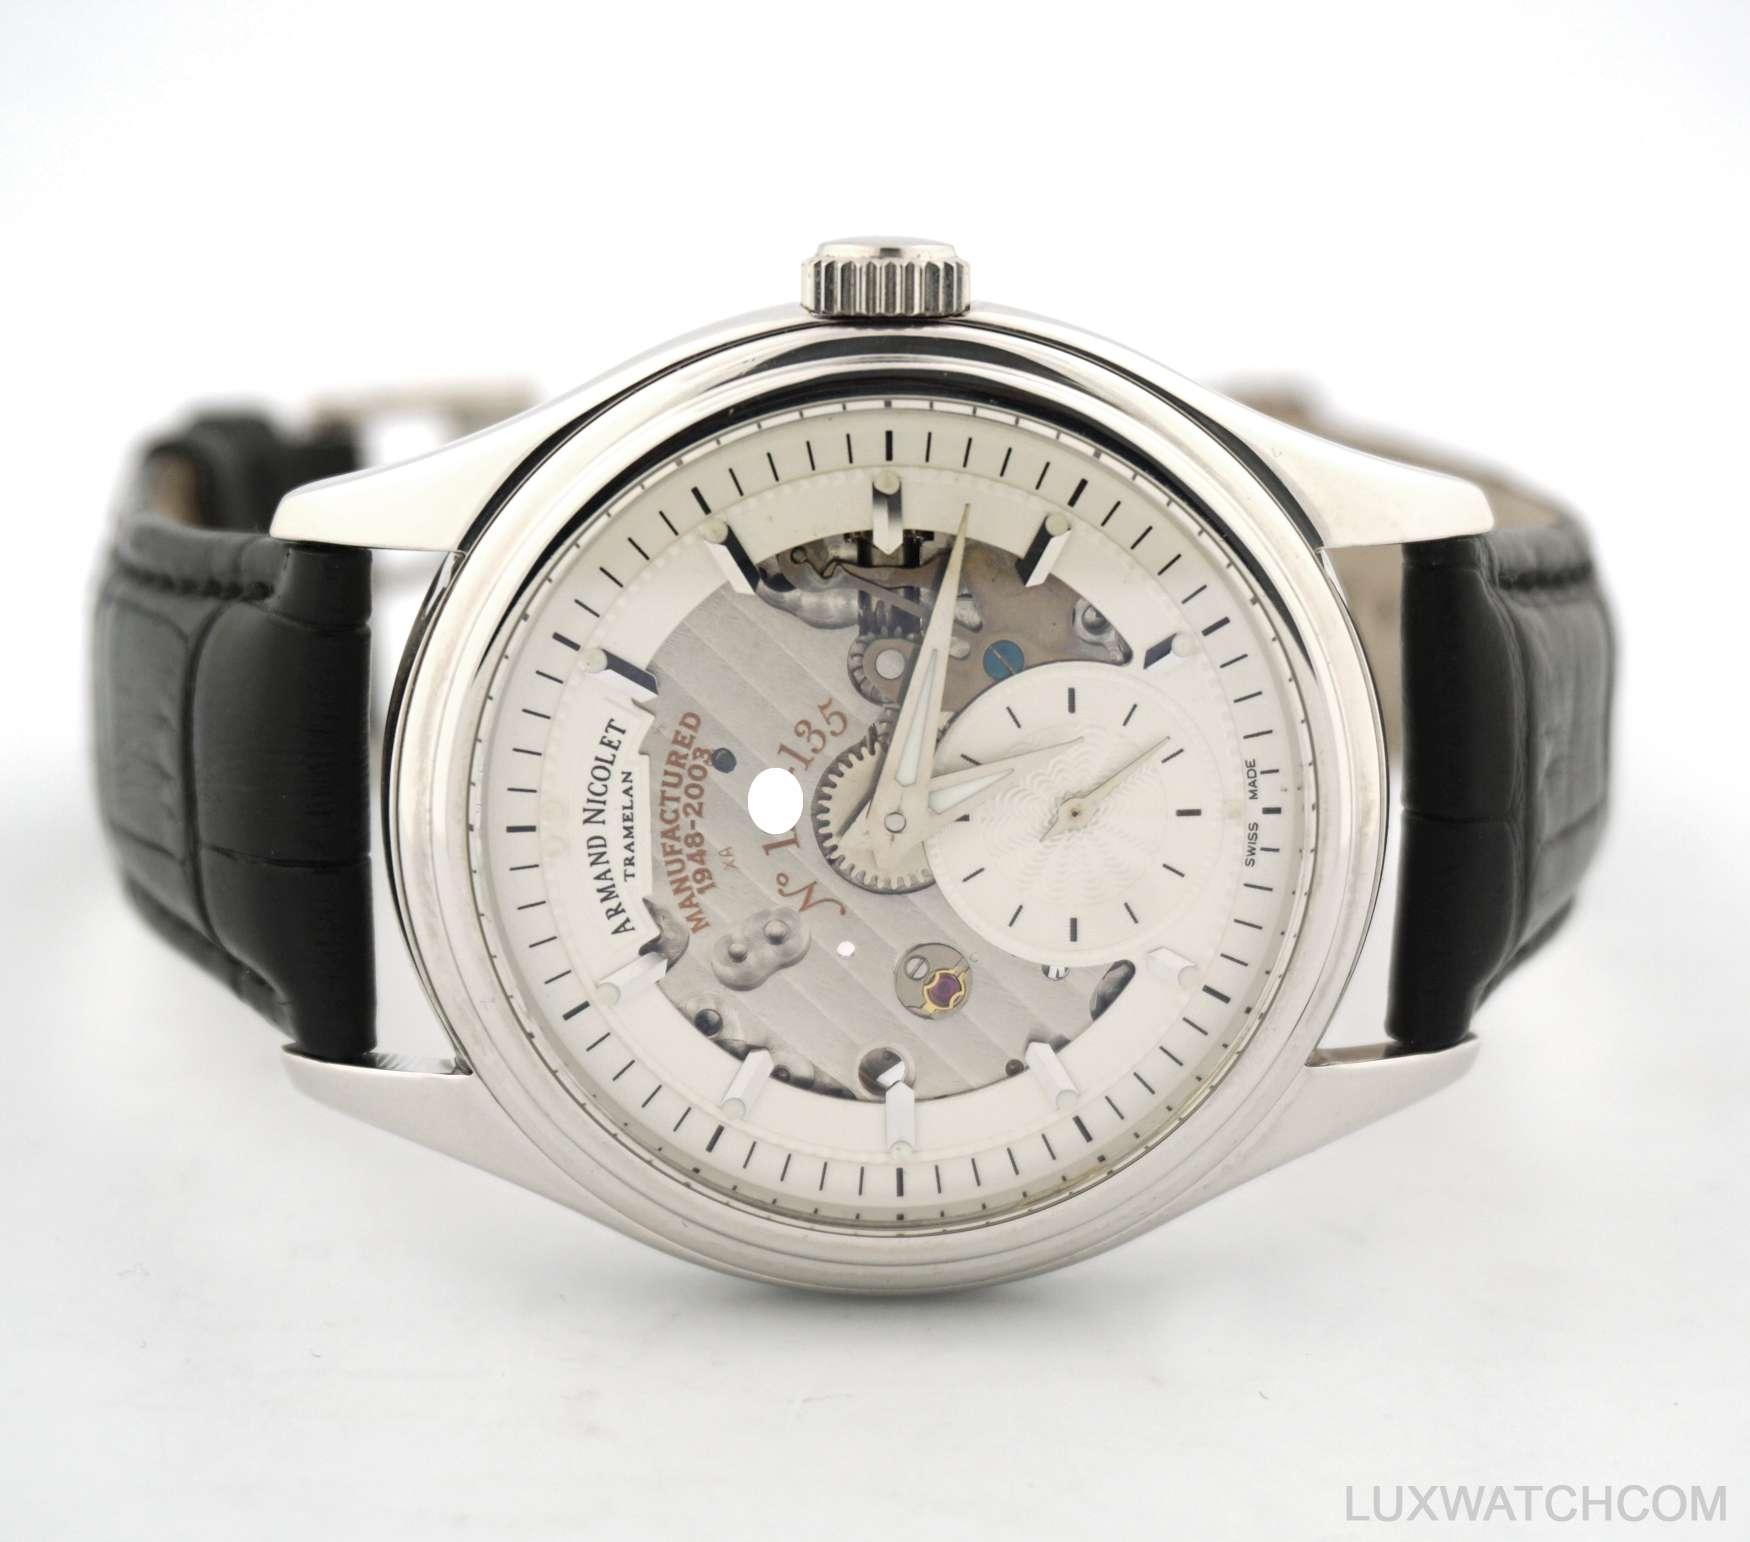 Armand nicolet tramelan 18k white gold 7140 mens watch ebay for Armand nicolet watches